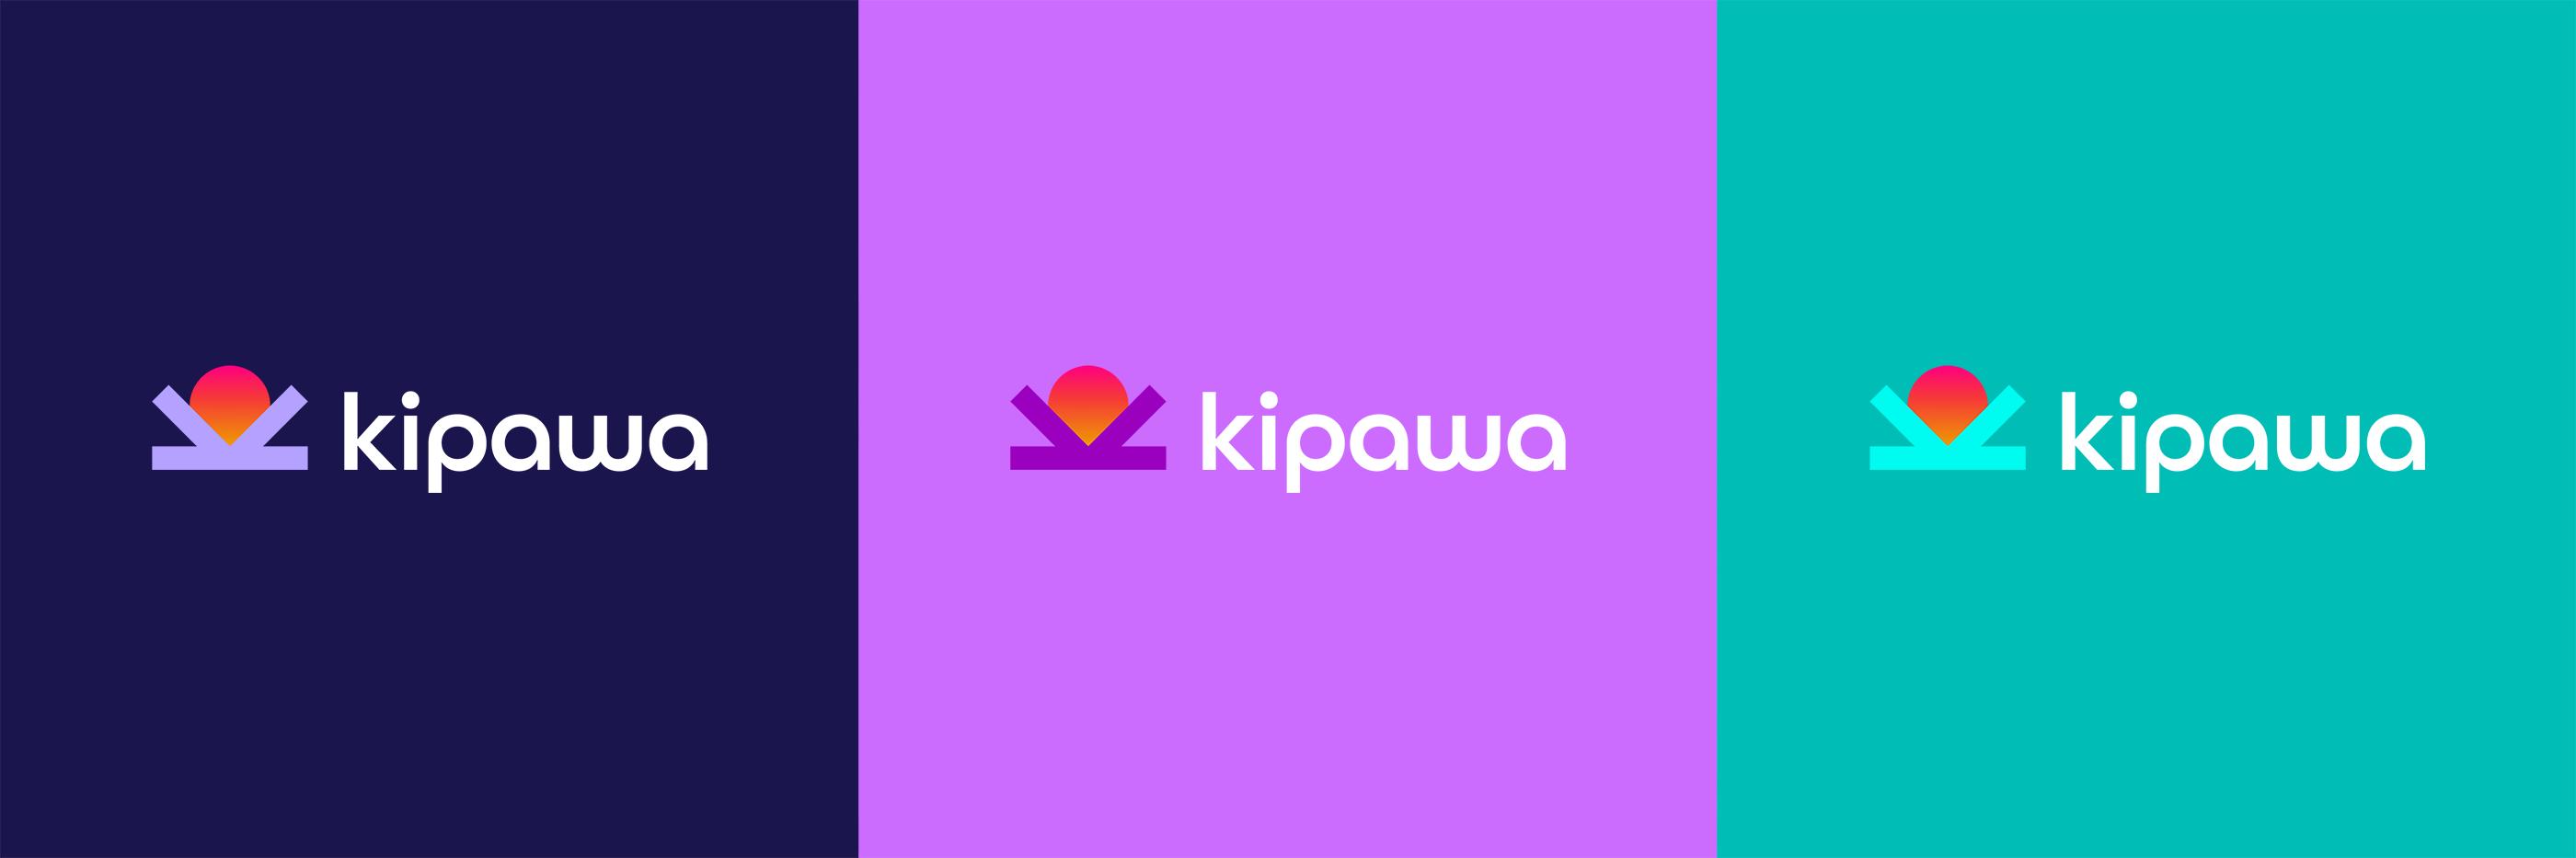 Bright, bold brand identity for a recruitment marketing agency in Kenya